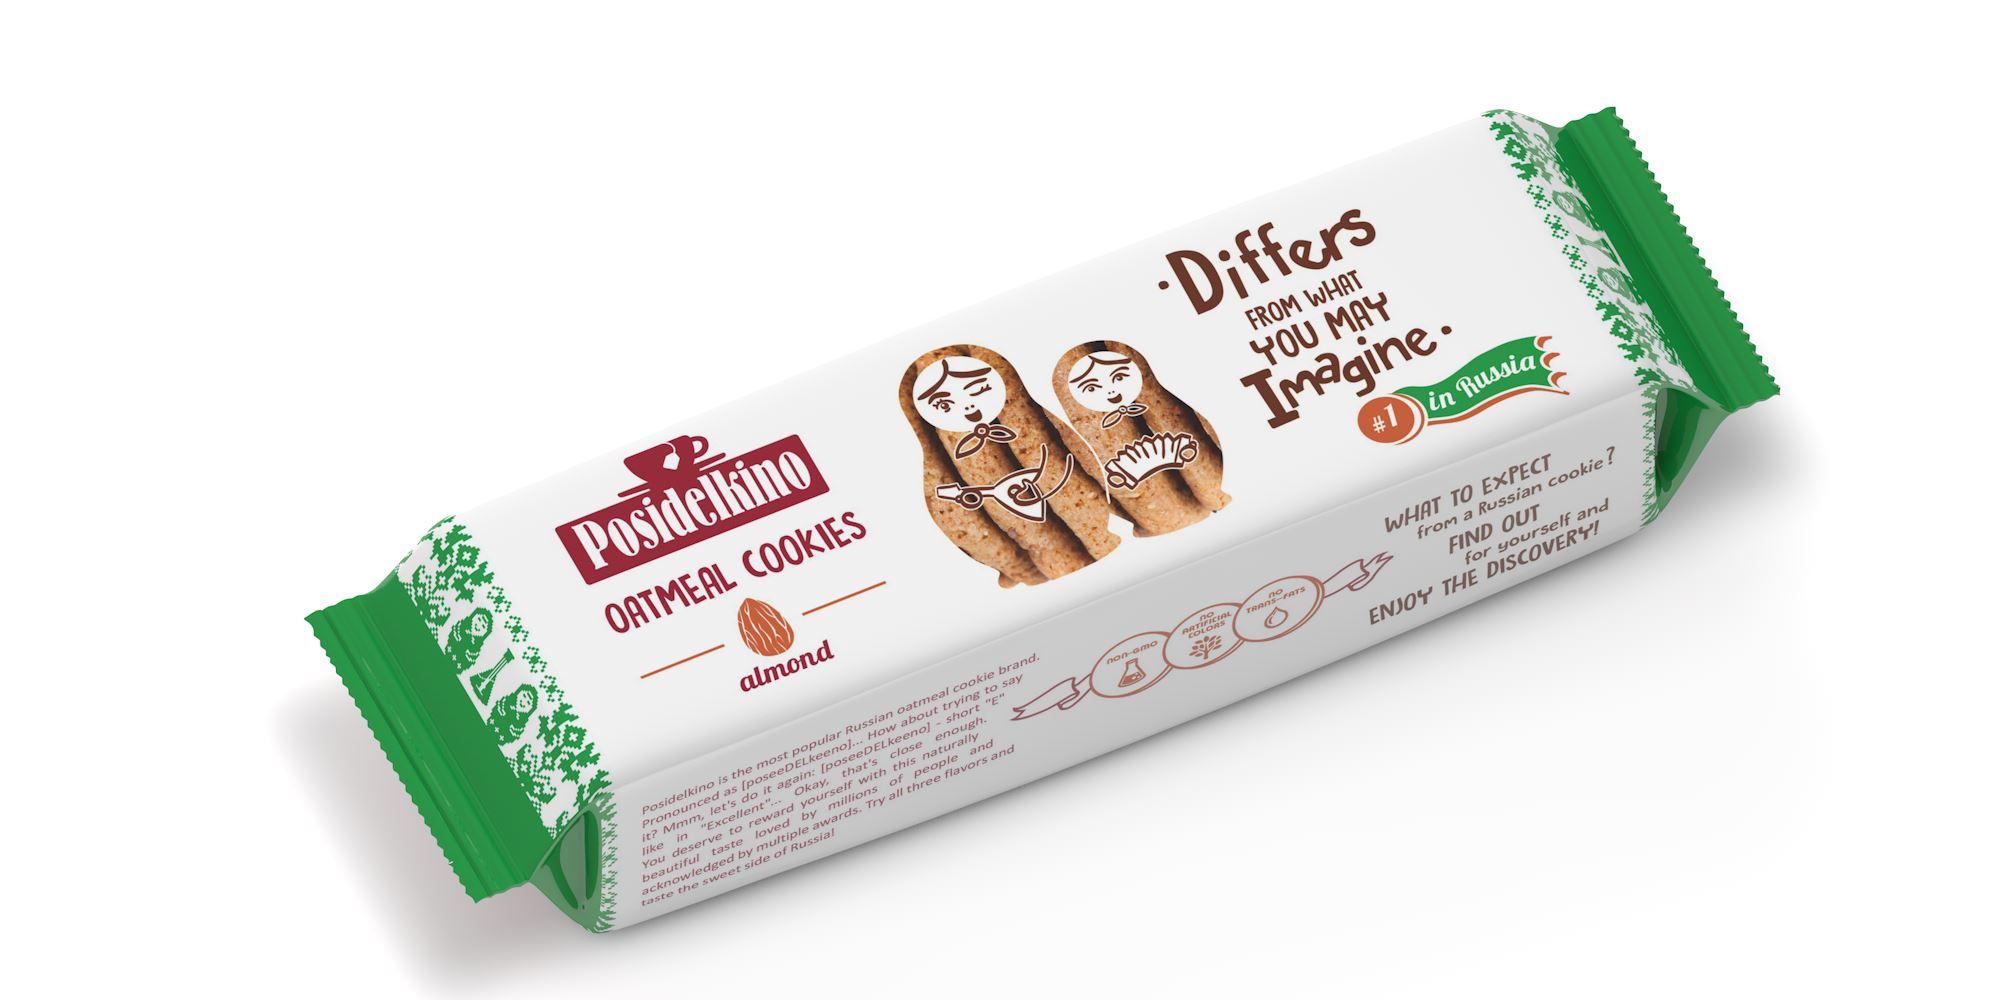 Oatmeal Cookies Almond 300g